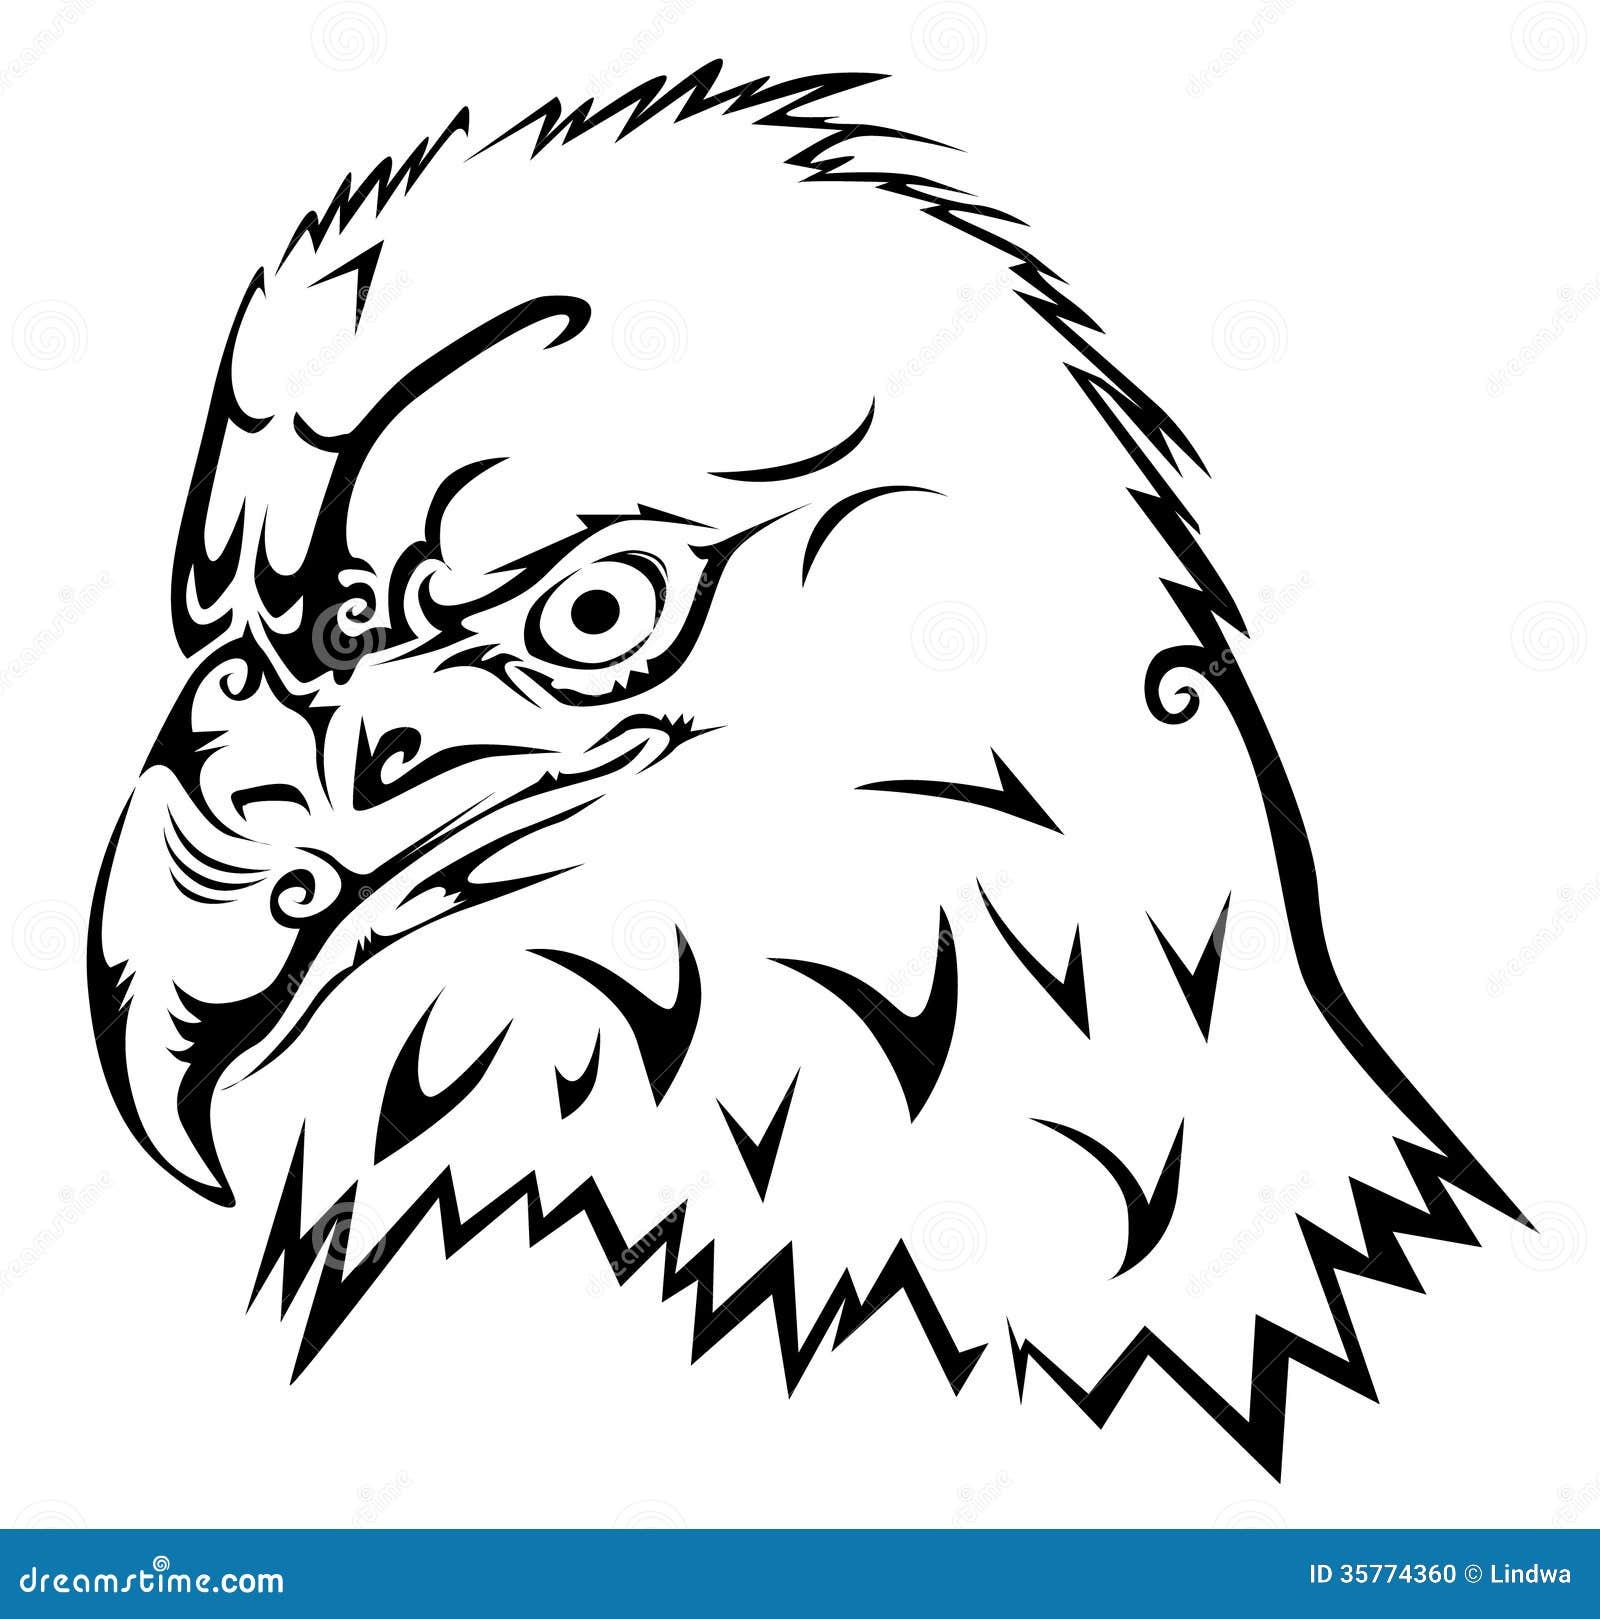 tribal tattoo eagle vector tribal tattoo background. Eagle illustration